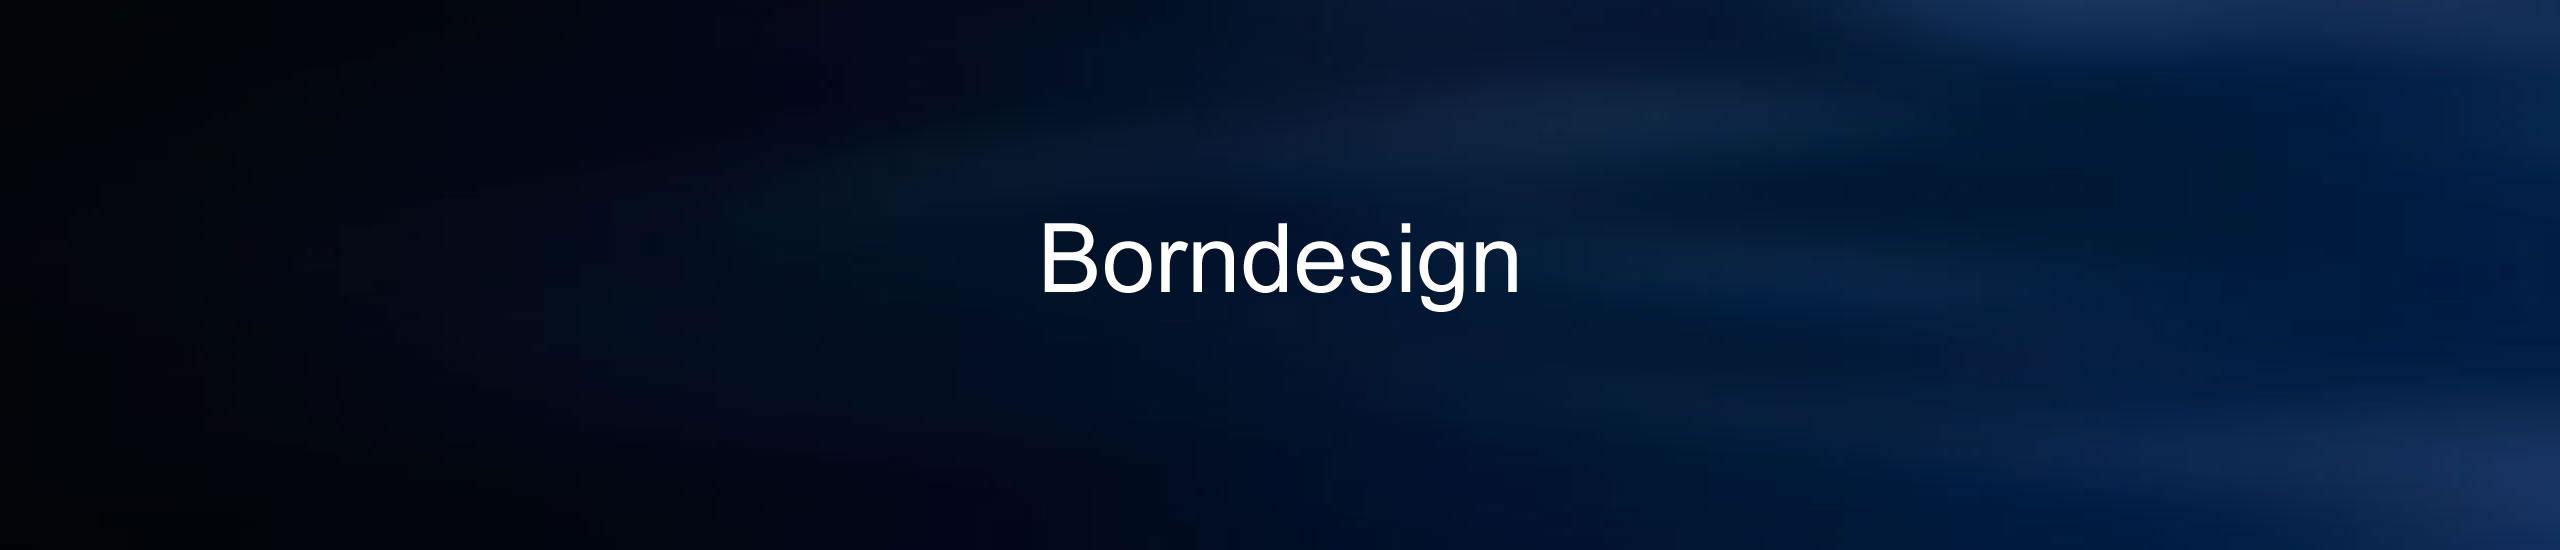 Borndesign Mobi